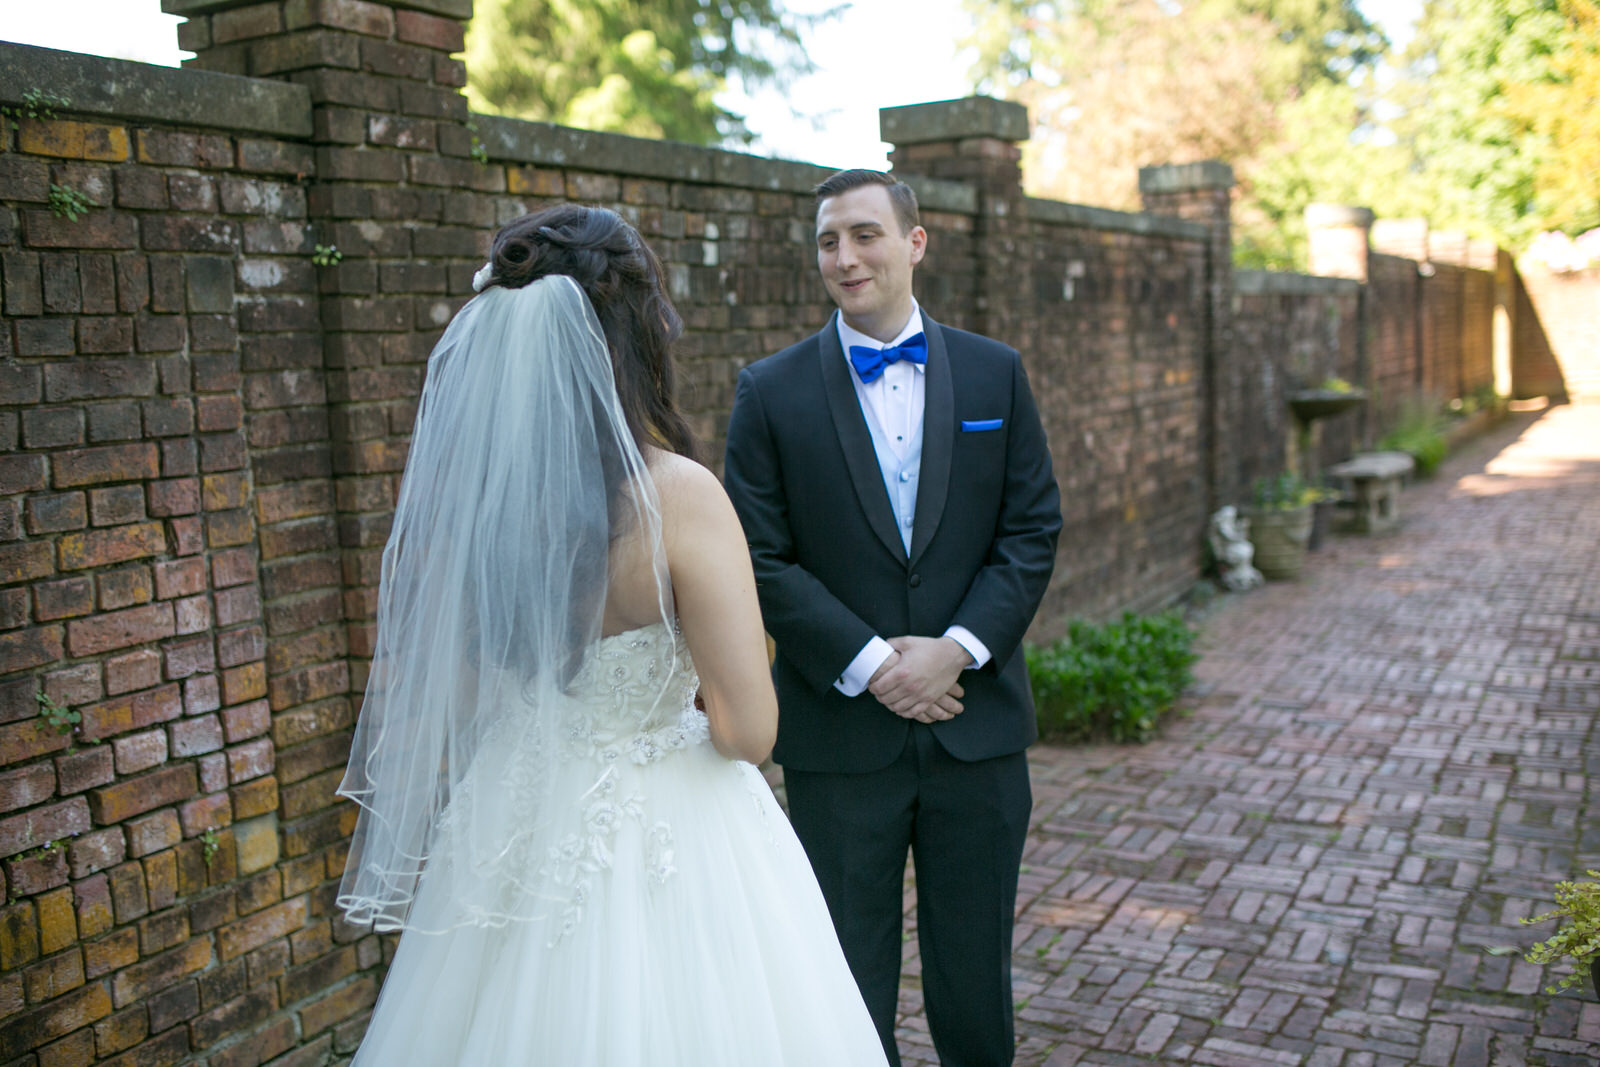 Thornewood Castle Wedding Kate and Daniel Wedding Web11.jpg